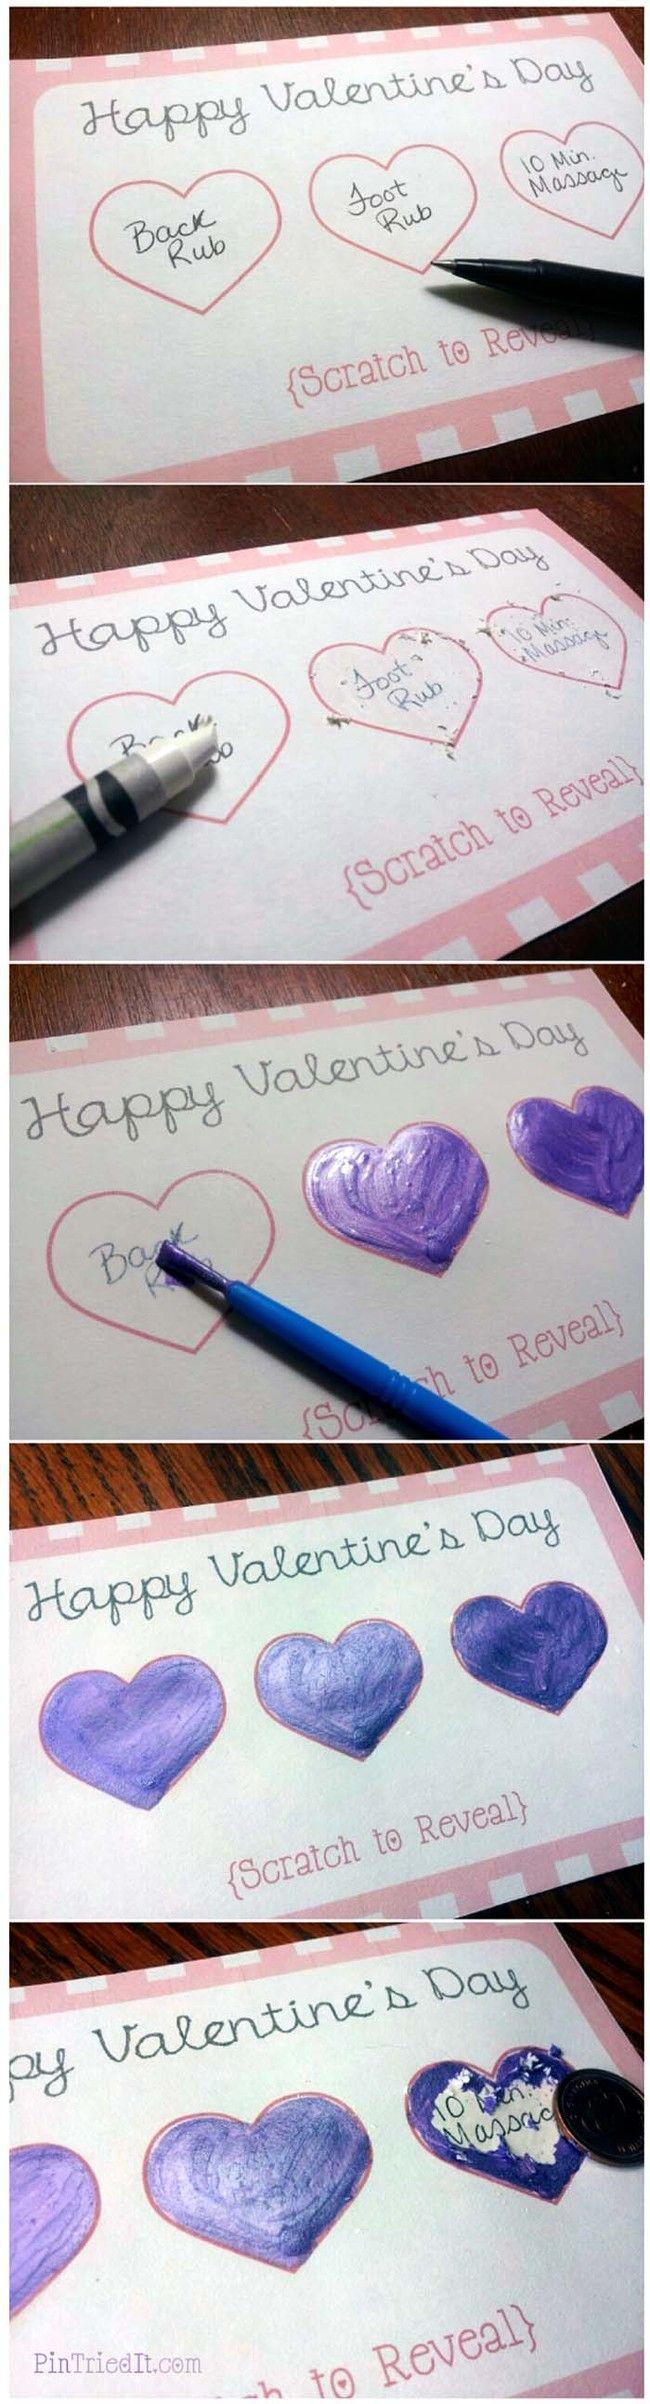 Romantic scratch off cards diy life hacks pinterest romantic romantic scratch off cards solutioingenieria Gallery